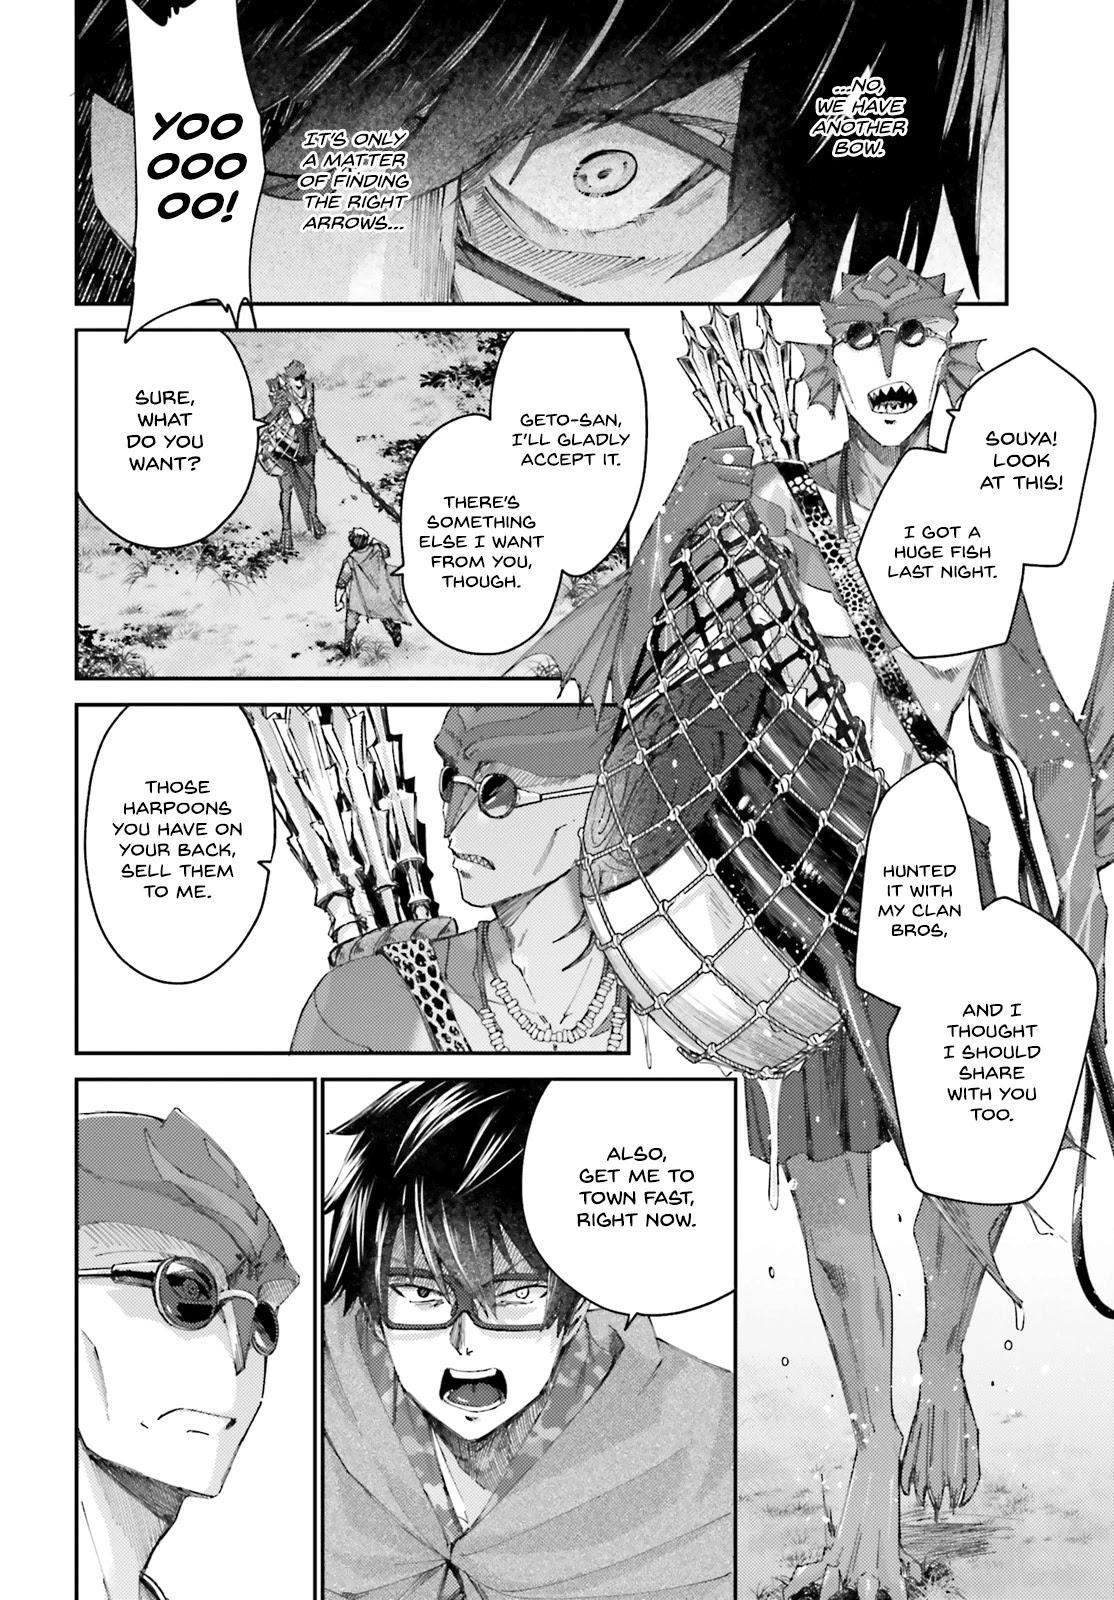 Ihoujin, Dungeon Ni Moguru Chapter 9: The Shadow Asks Your Heart page 25 - Mangakakalots.com